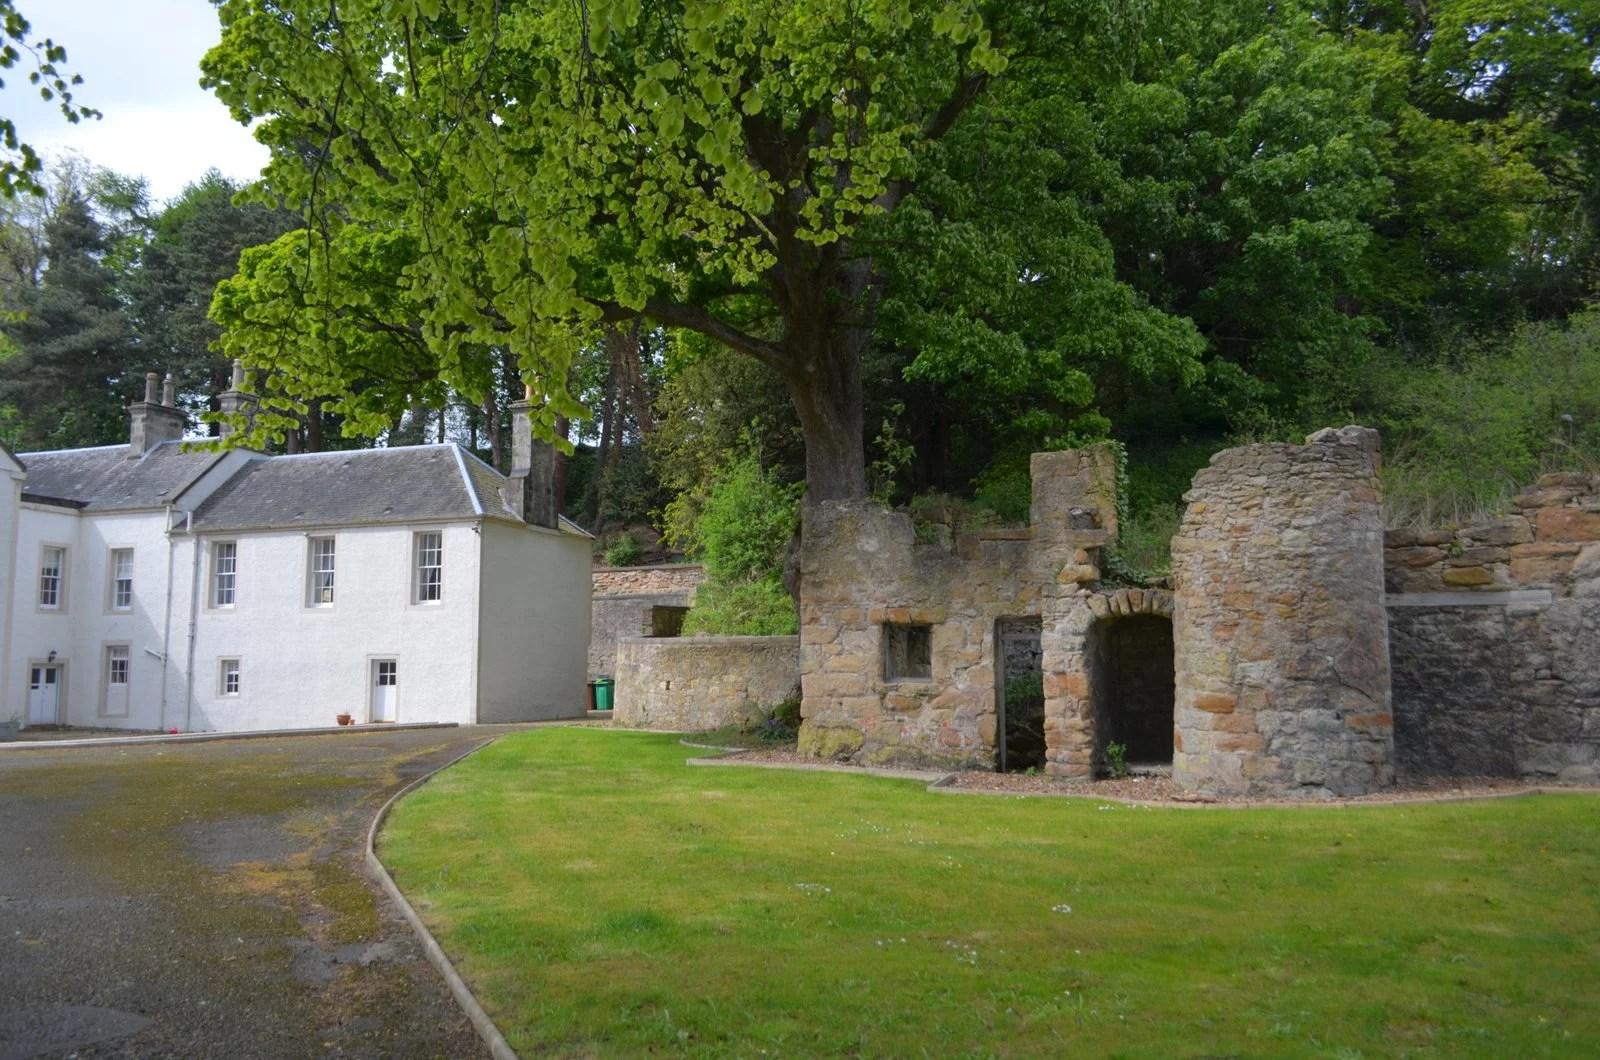 Culross, Fife Scotland